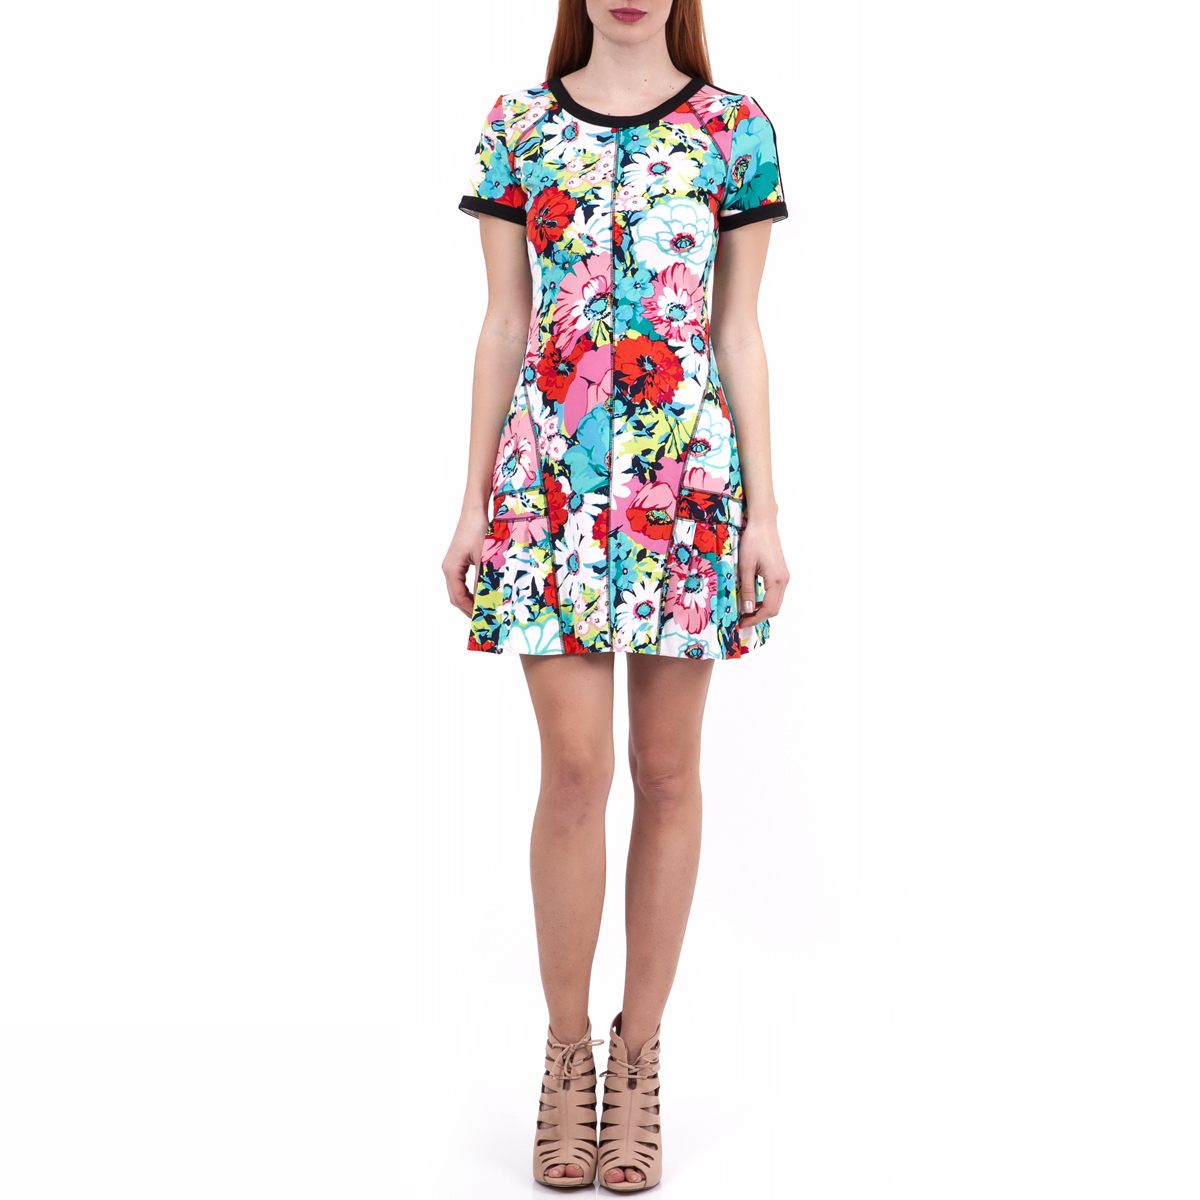 JUICY COUTURE - Γυναικείο φόρεμα Juicy Couture γαλάζιο-κόκκινο γυναικεία ρούχα φορέματα μίνι